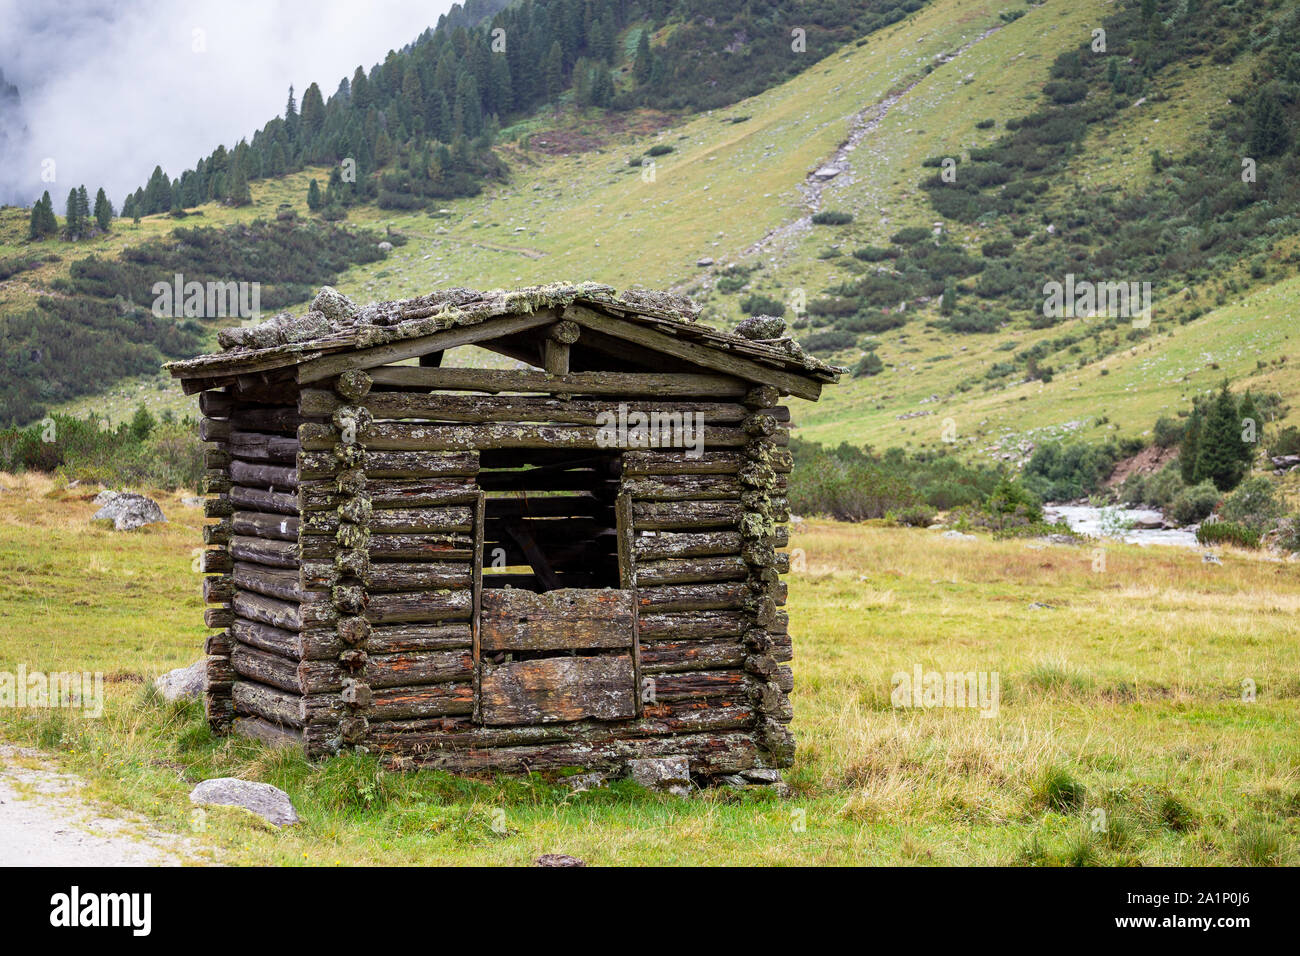 Wooden chalet. Krimmler Achen valley. Hohe Tauern National Park. Austrian Alps. Stock Photo